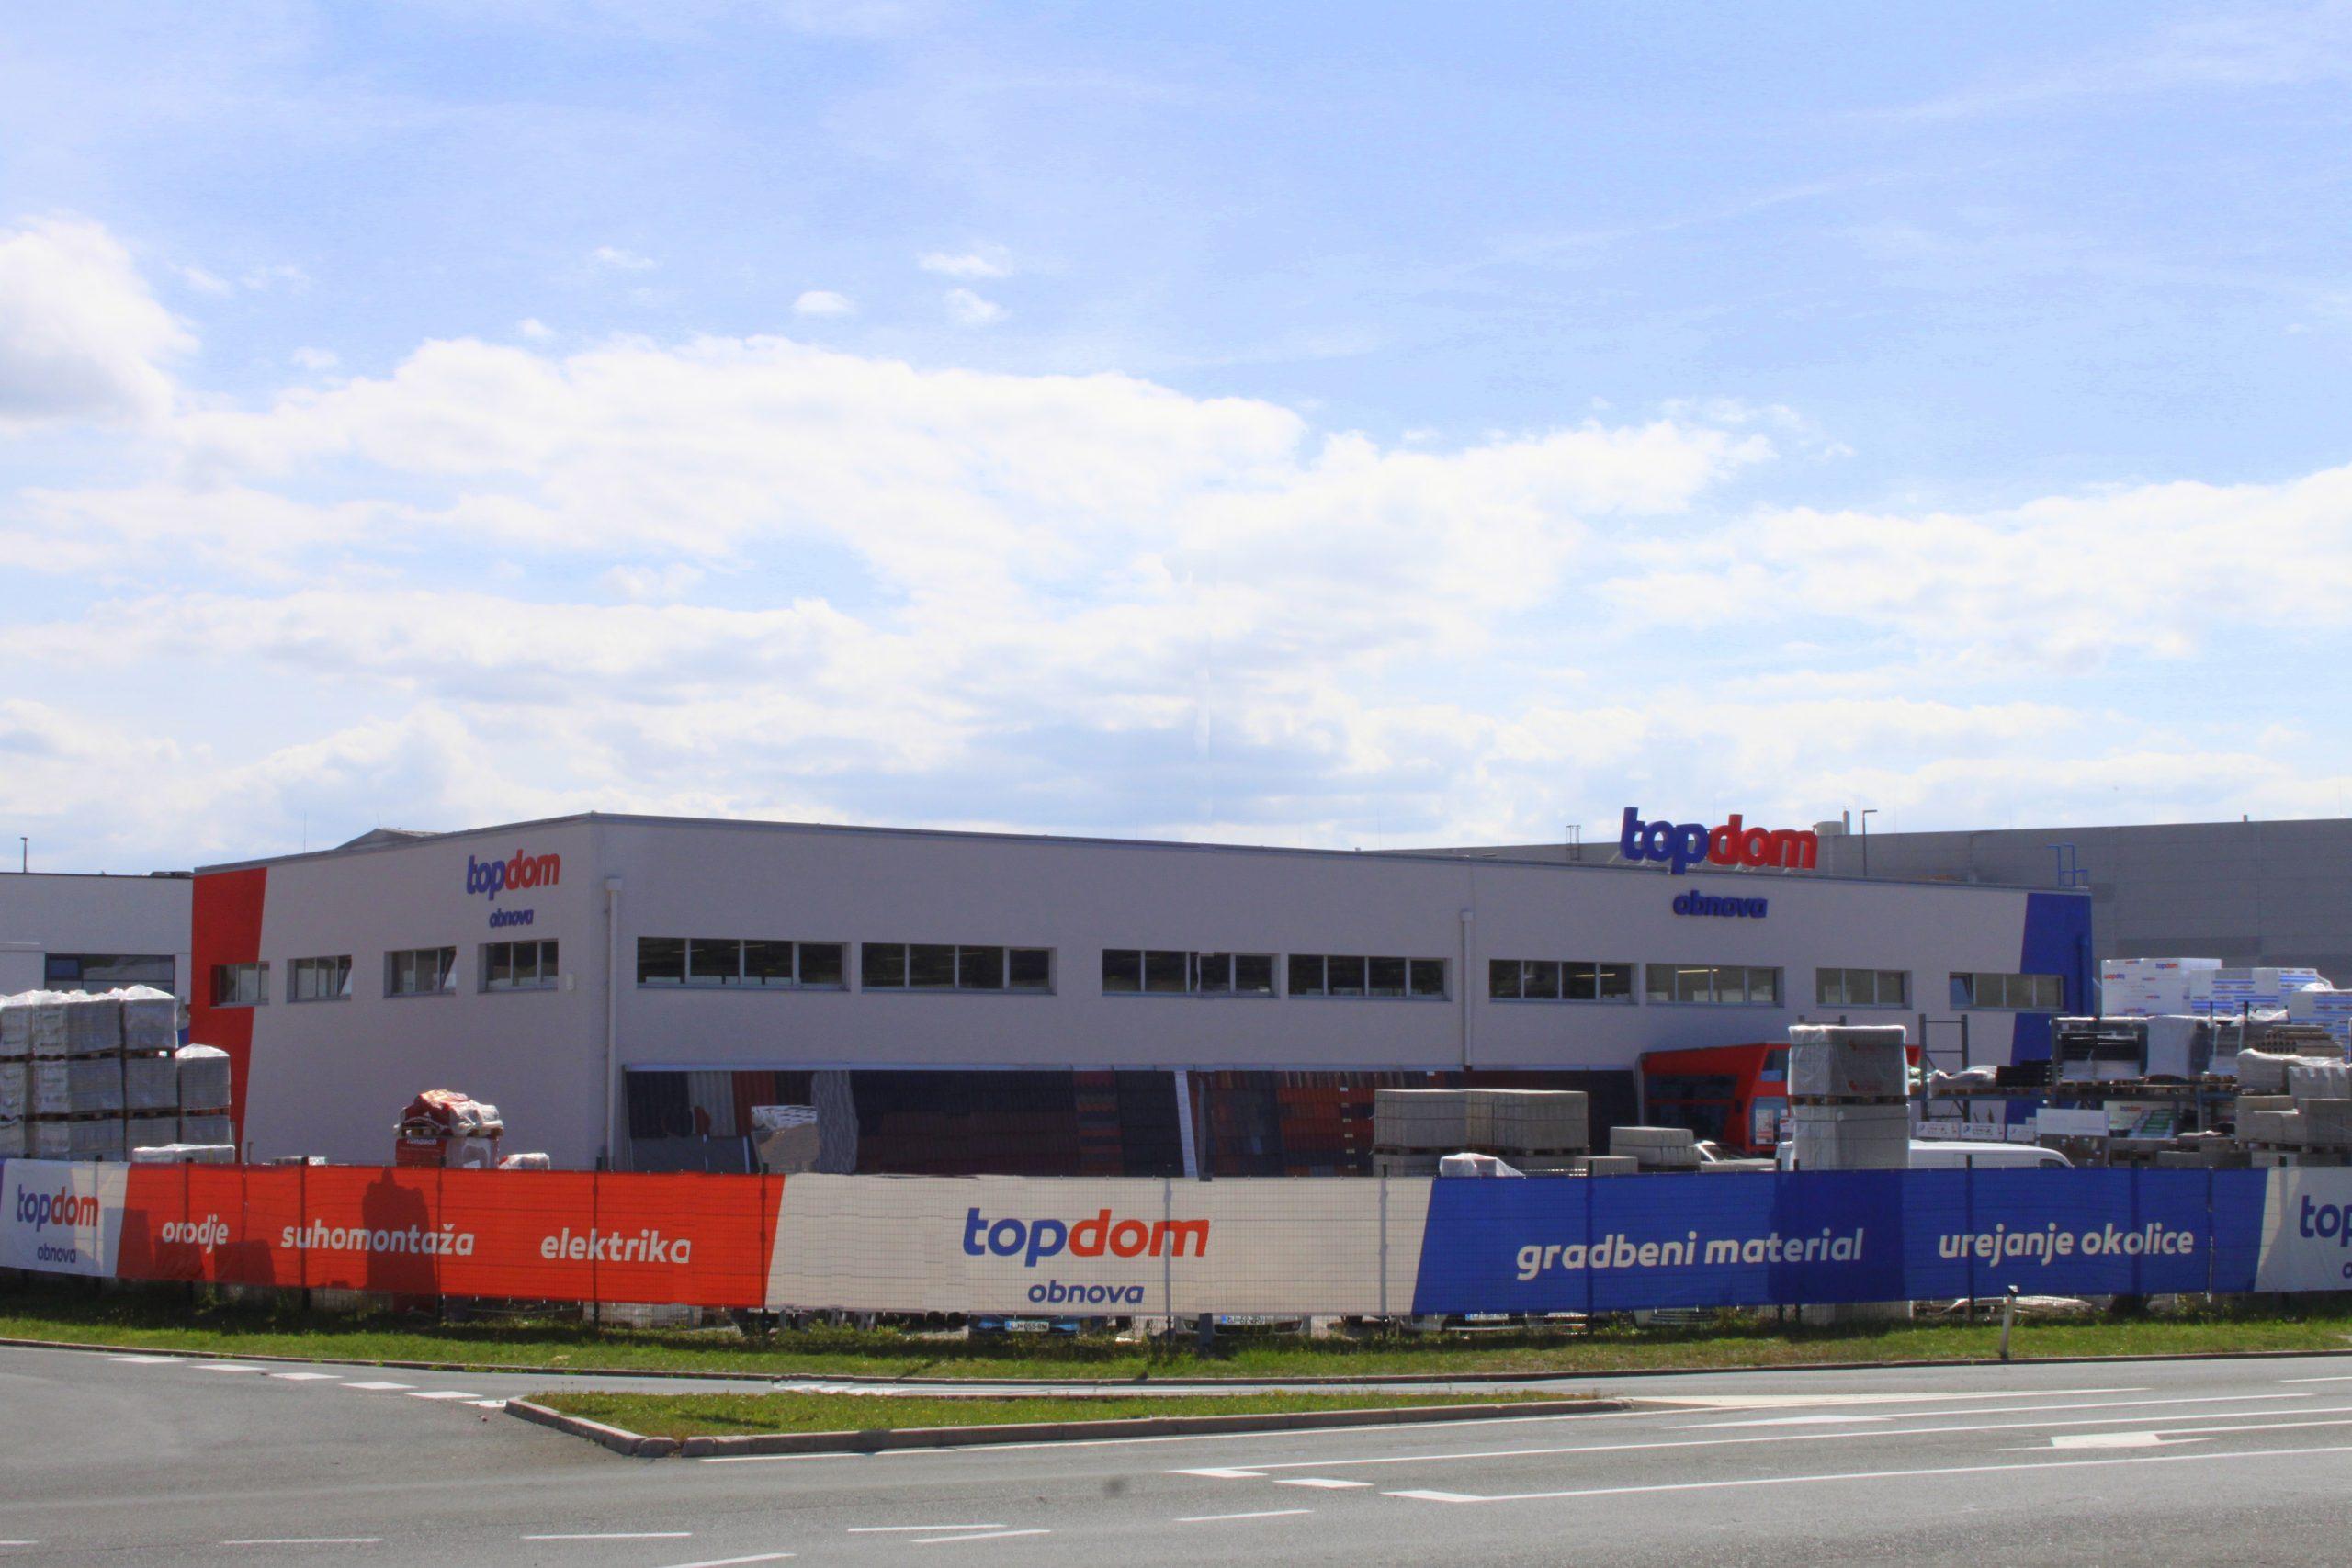 OBNOVA TRGOVINA <br /> IOC Zapolje<br /> 1370 Logatec<br /> Slovenija